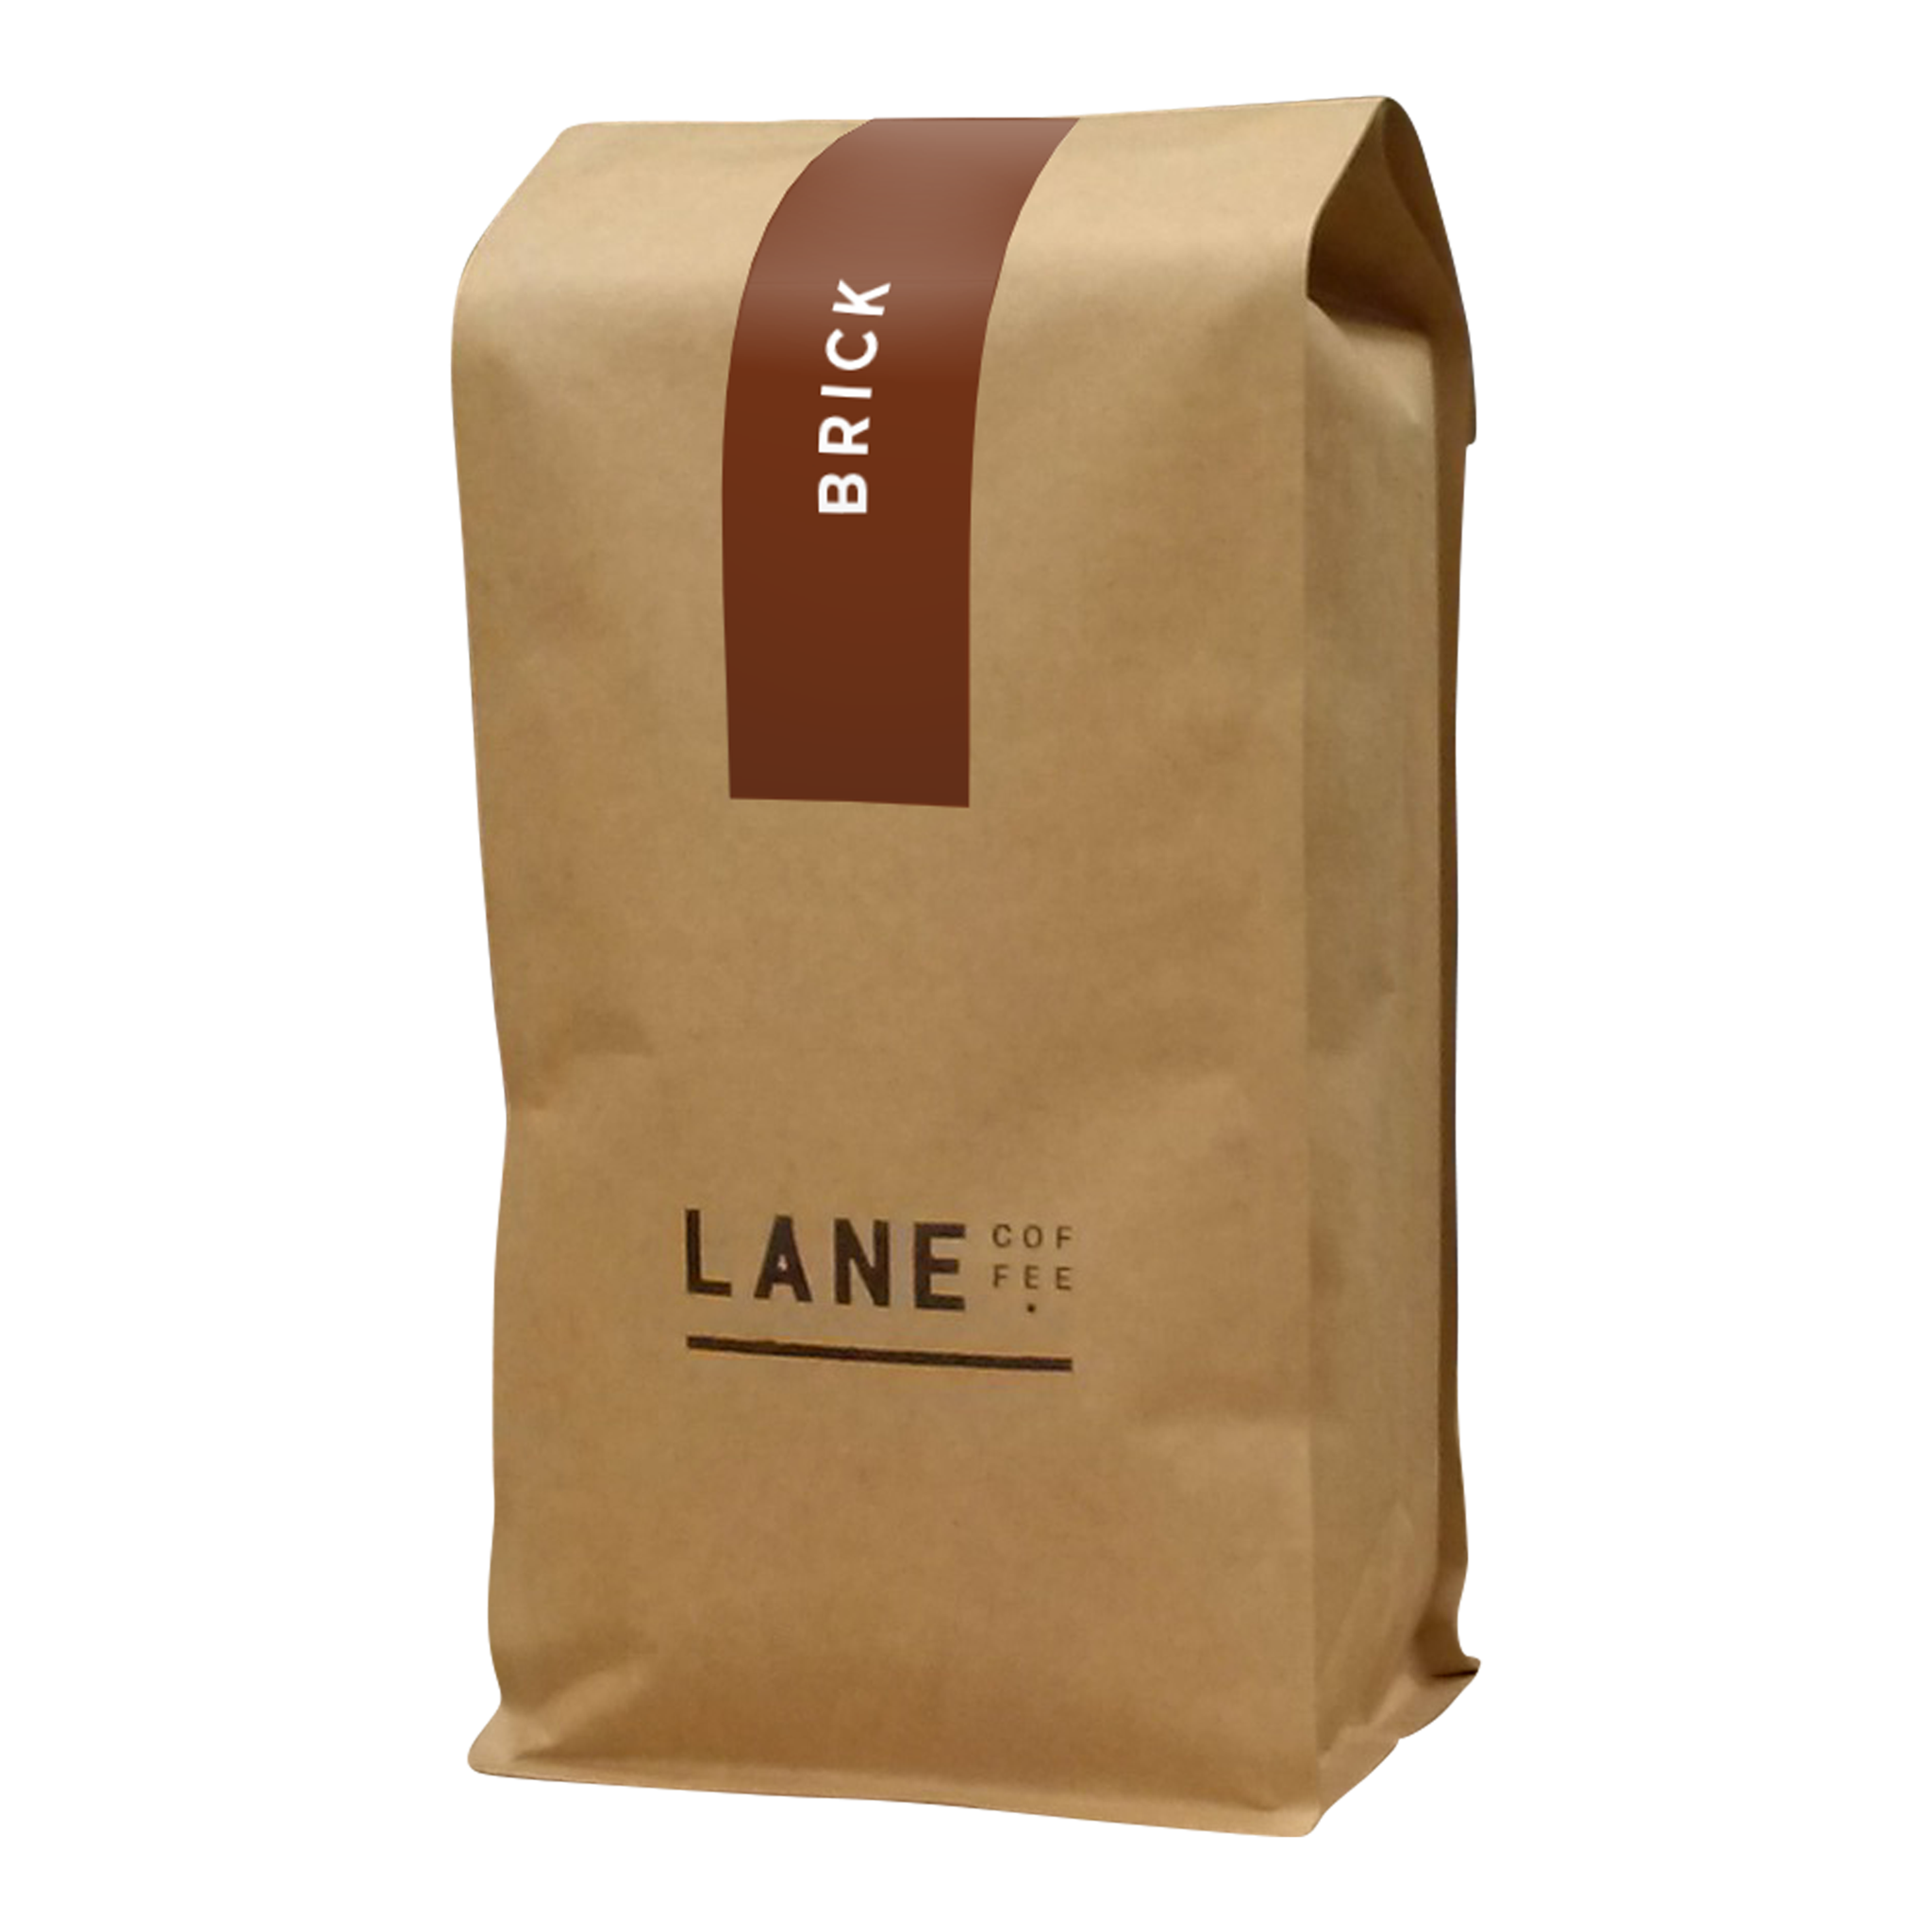 Lane Coffee Beans.